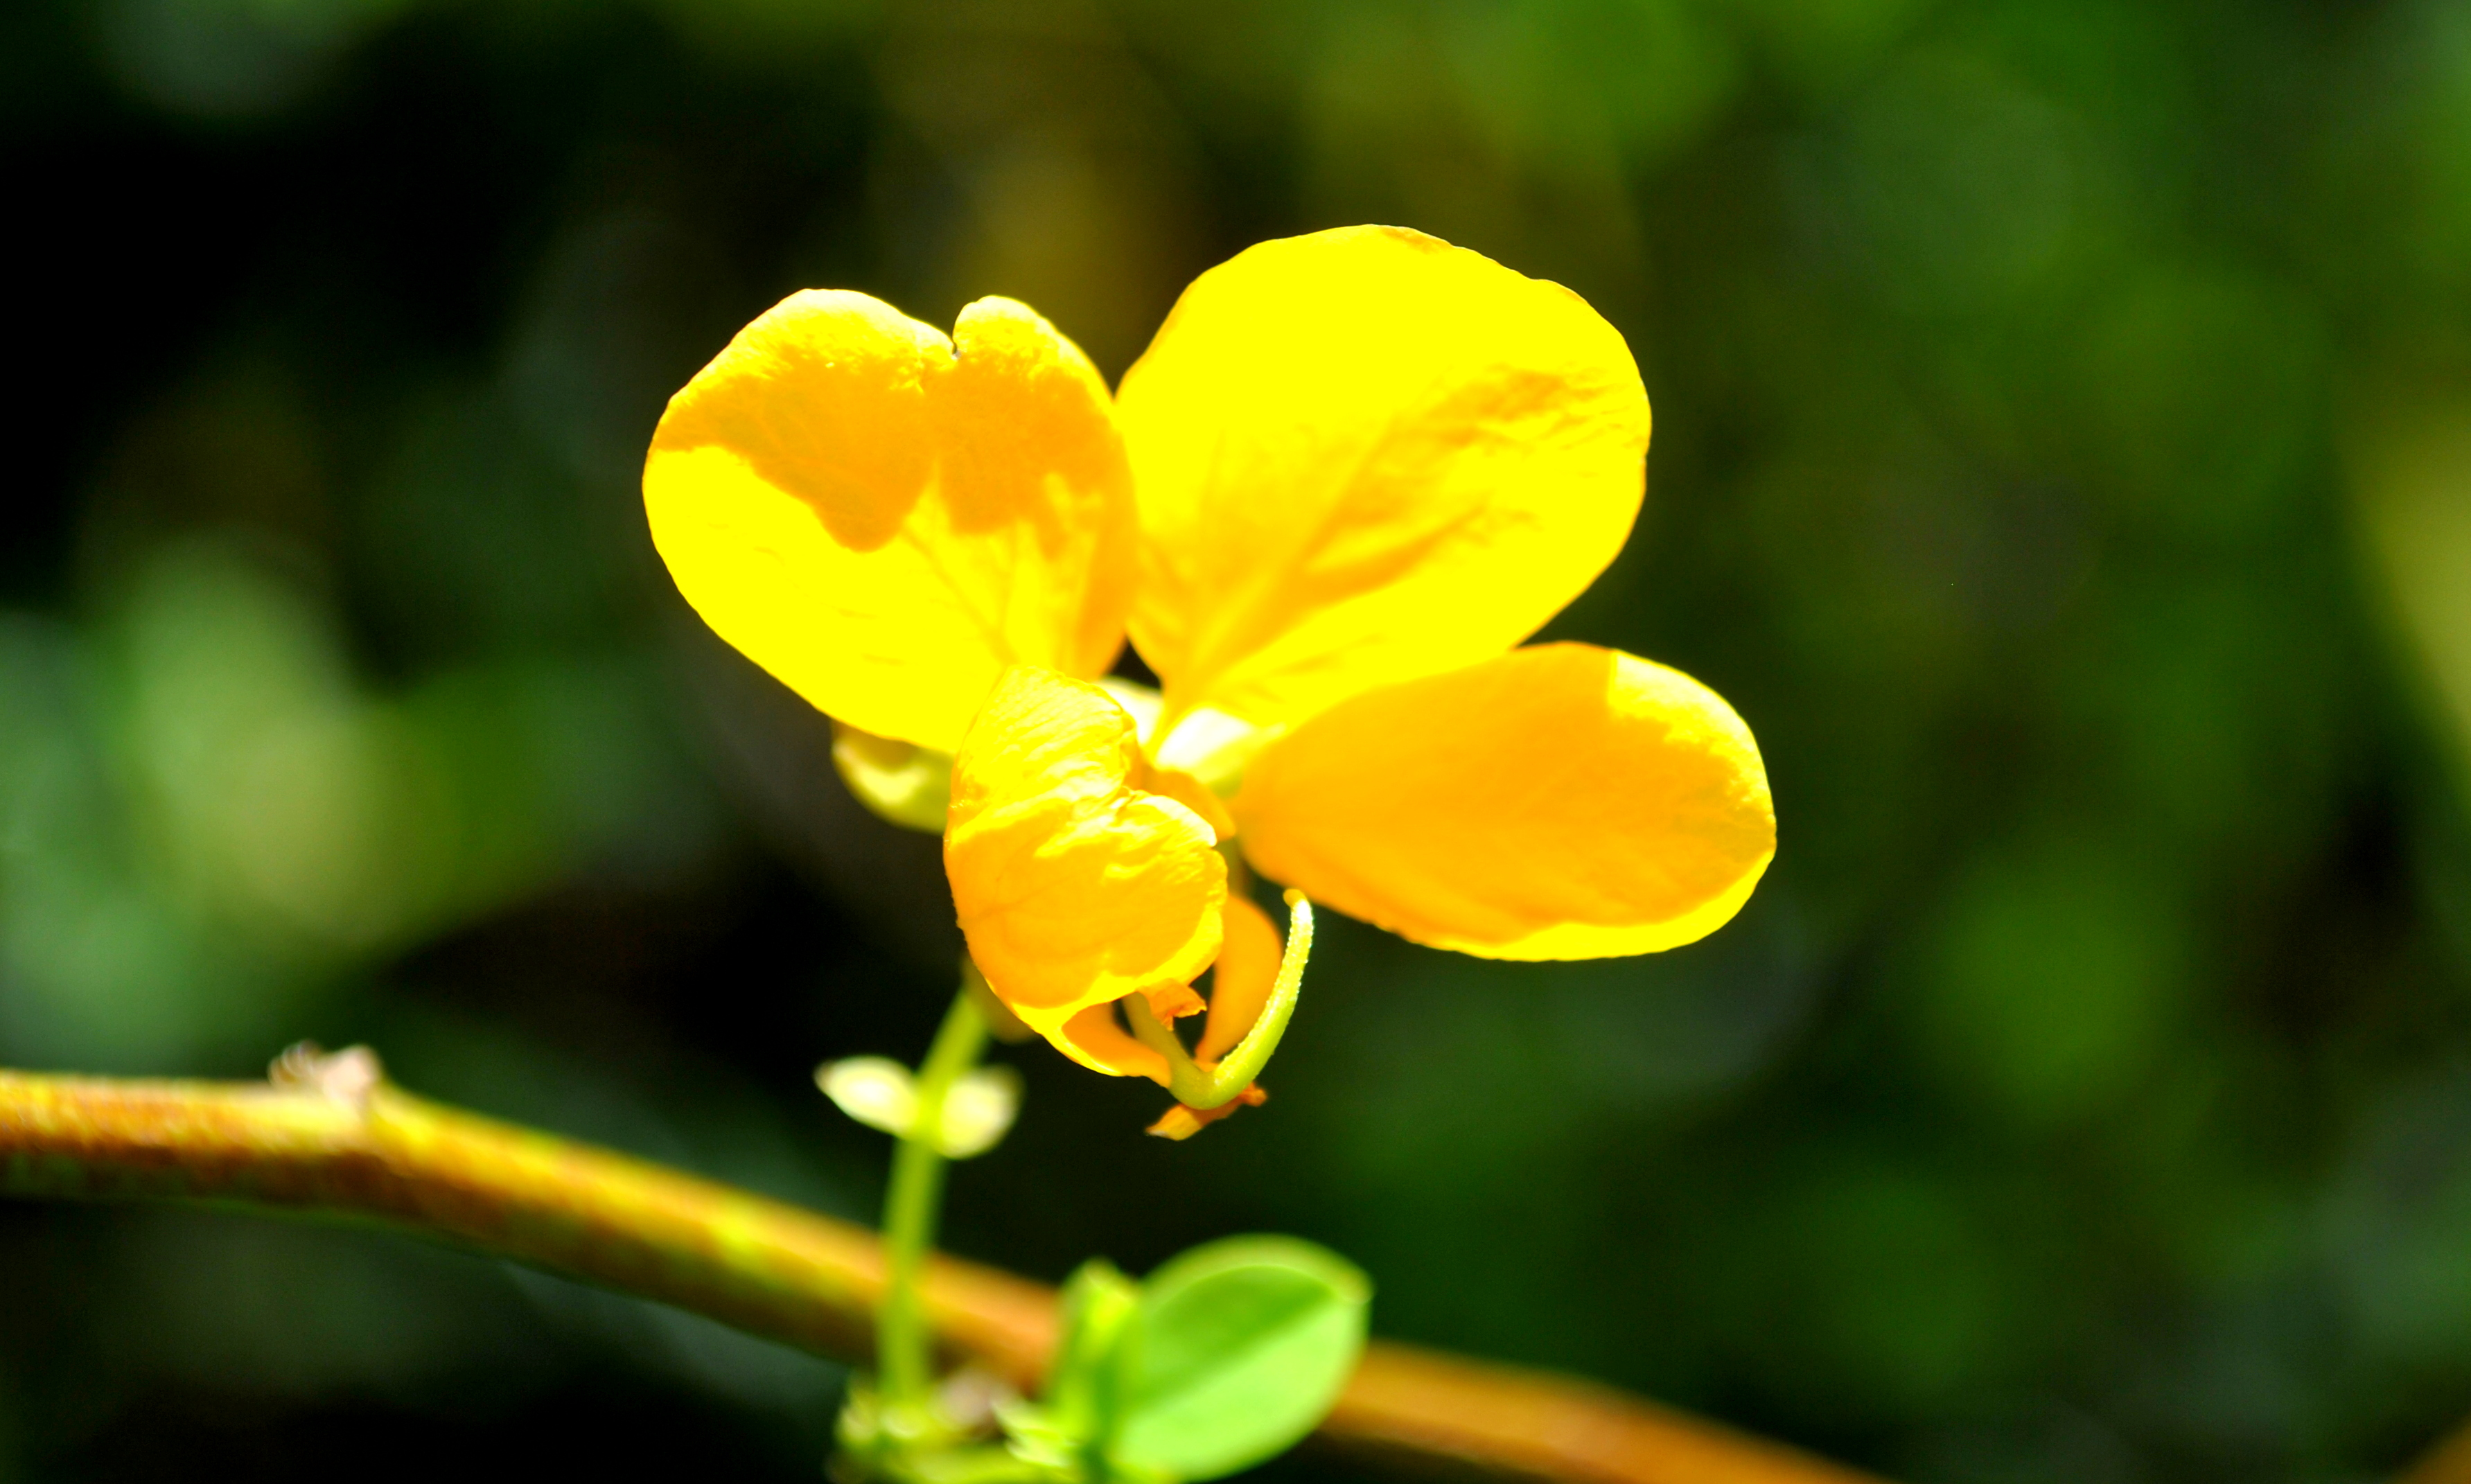 Free photo yellow flower yellow summer garden free download yellow flower yellow summer garden bloom hq photo mightylinksfo